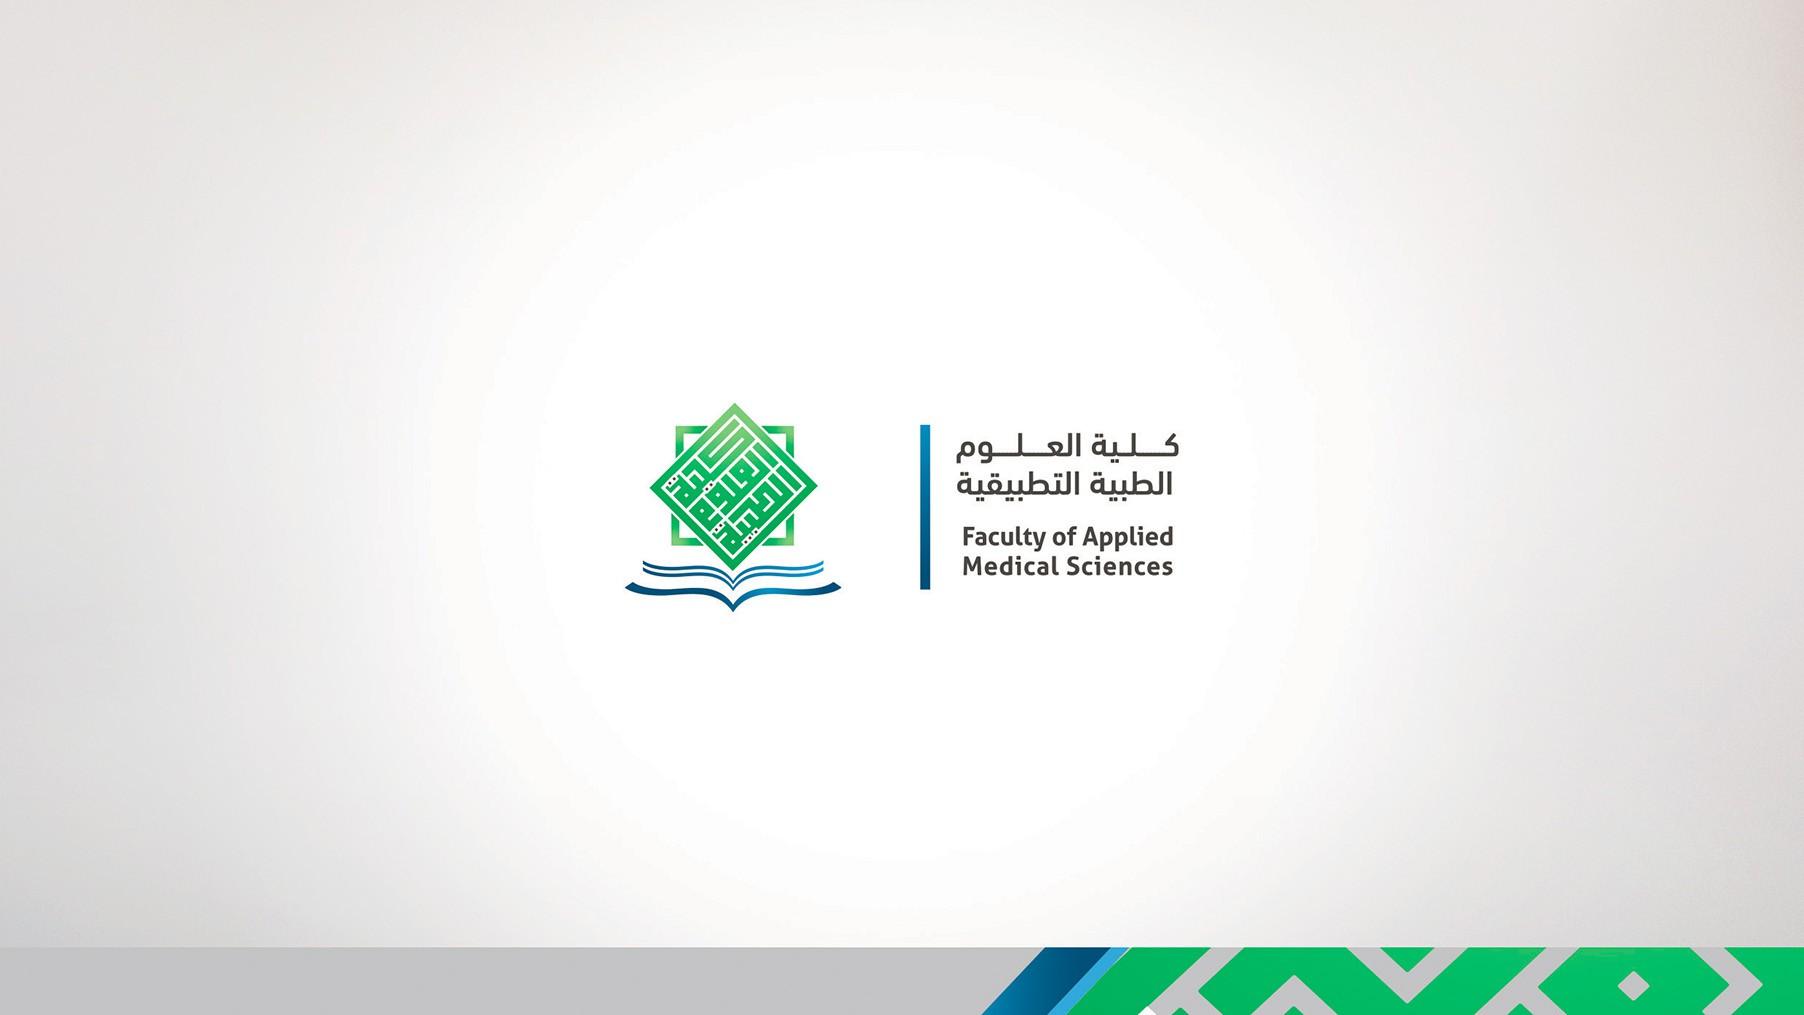 A logo for a medical faculty